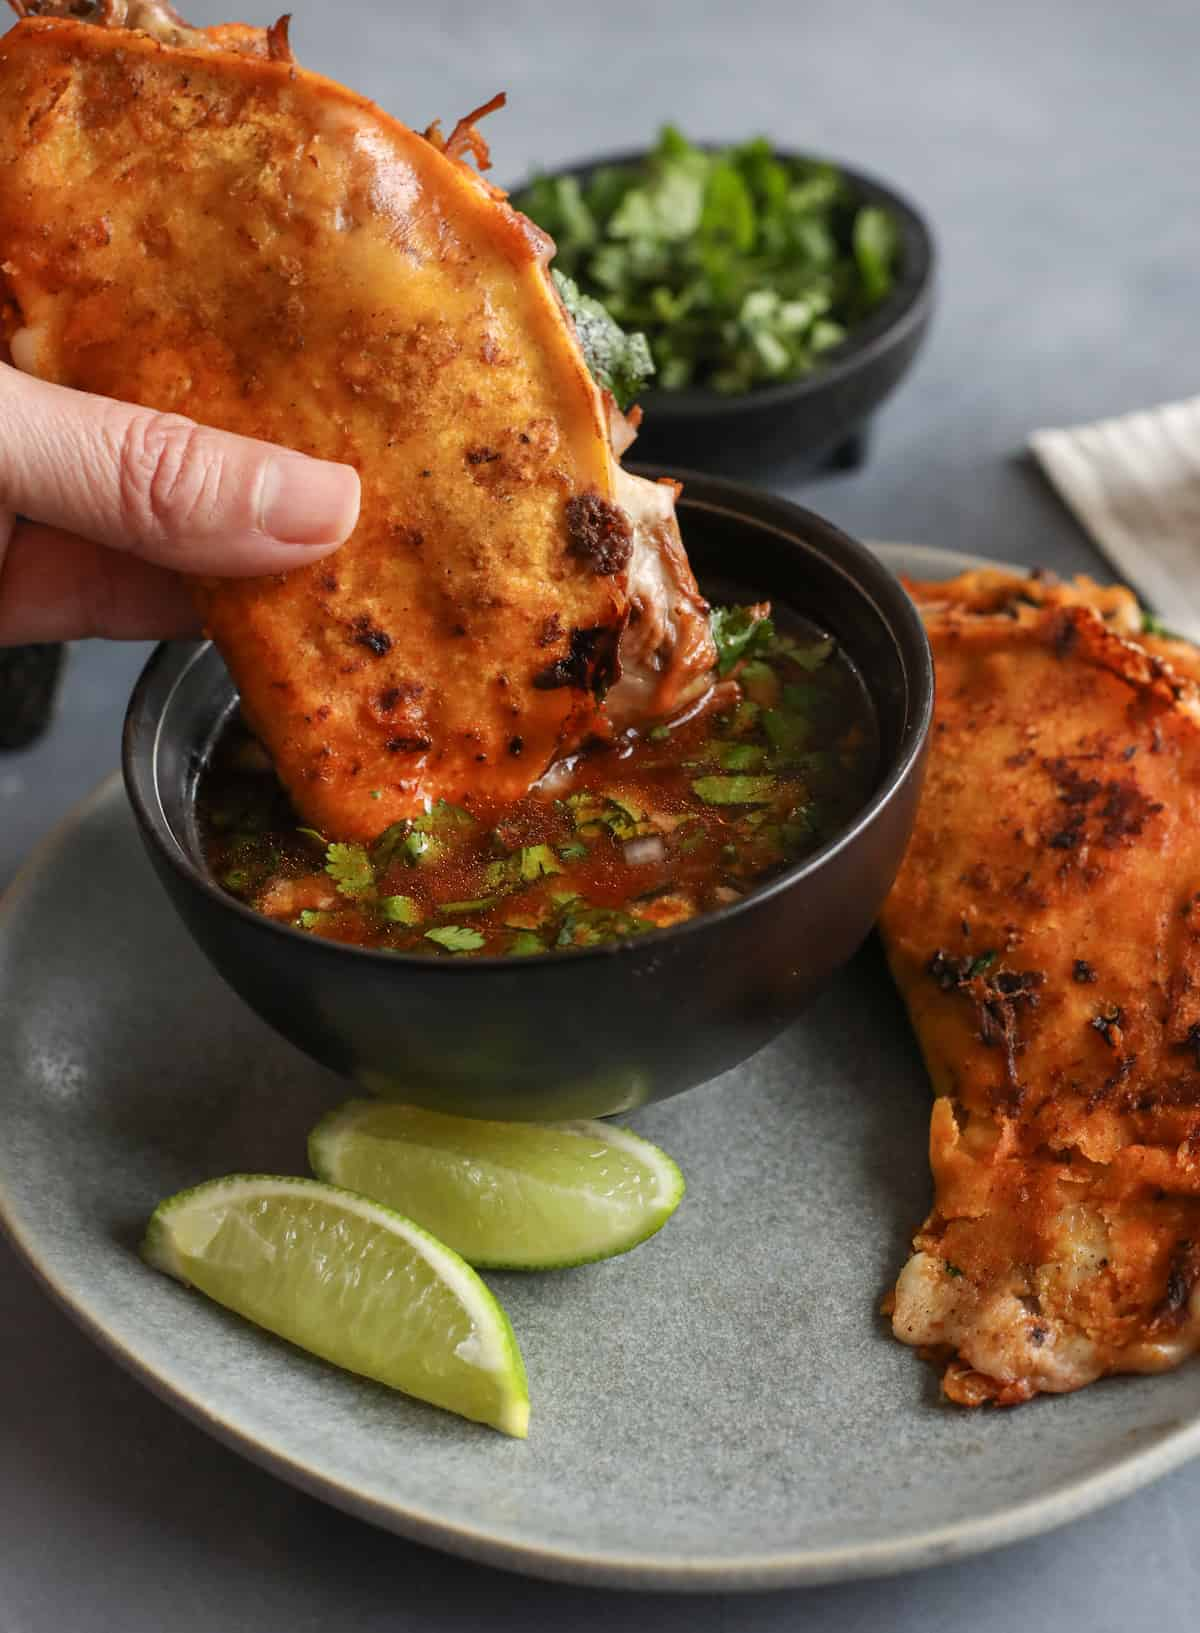 hand dipping cheesy quesabirria taco into birria sauce